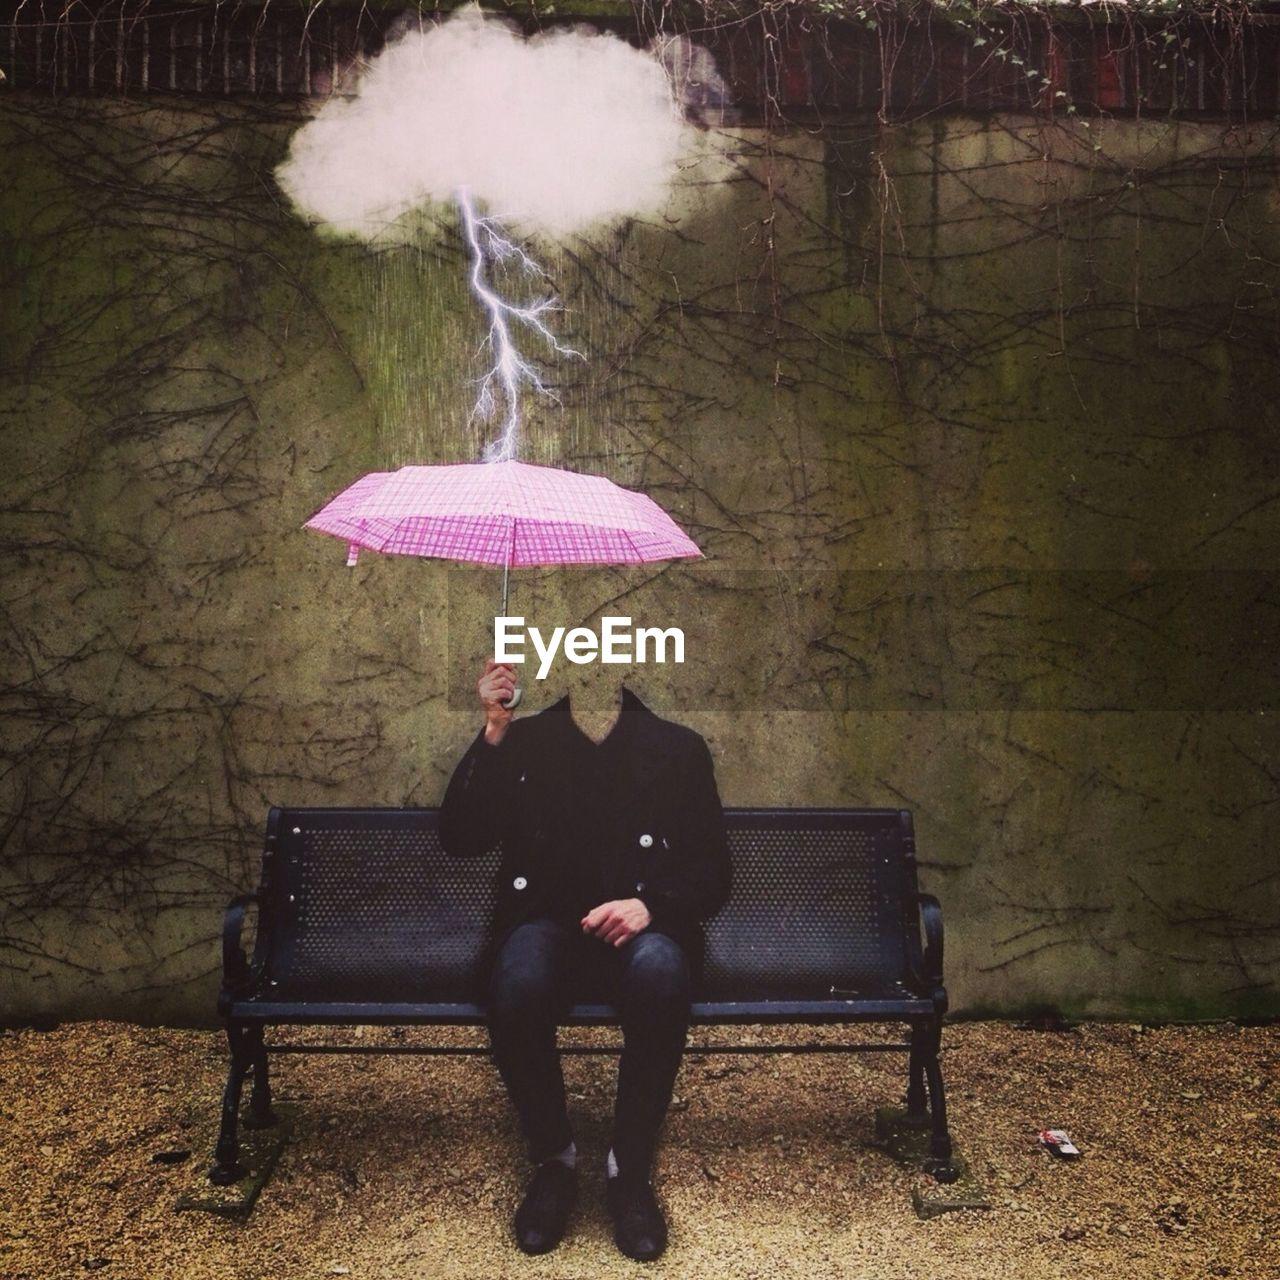 Decapitated man sitting under pink umbrella